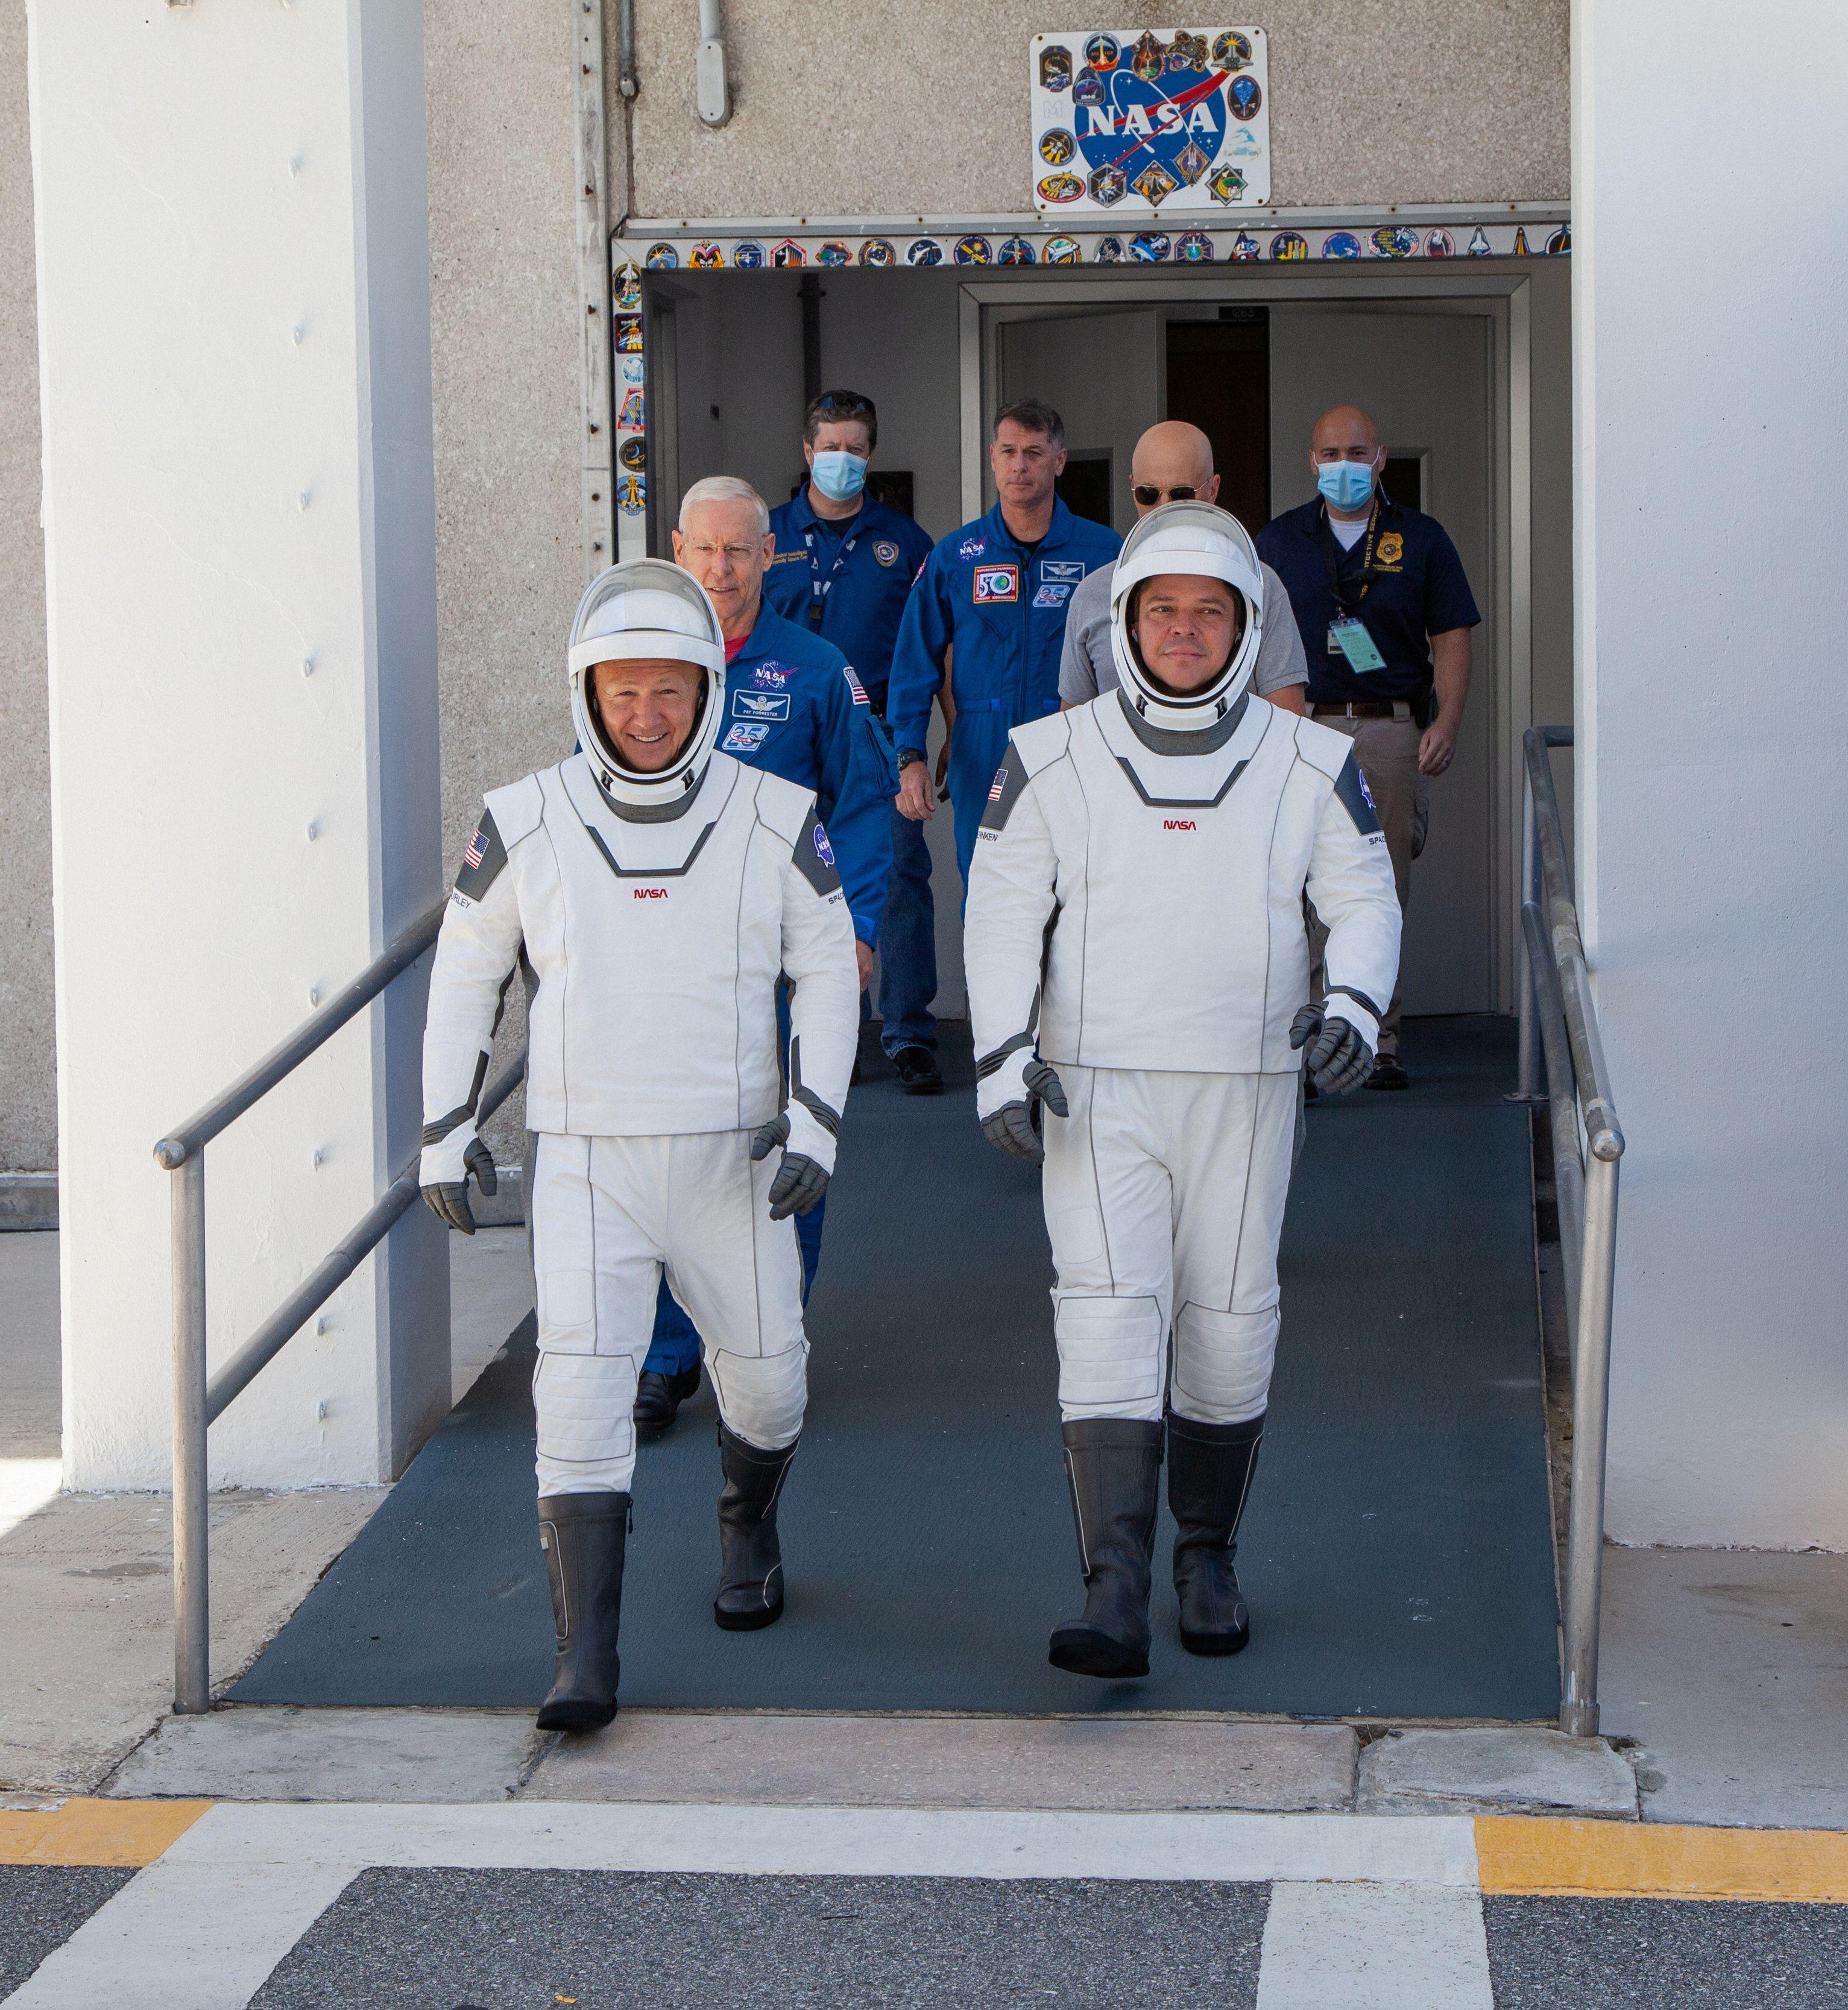 (NASA/Brandon Garner via REUTERS)